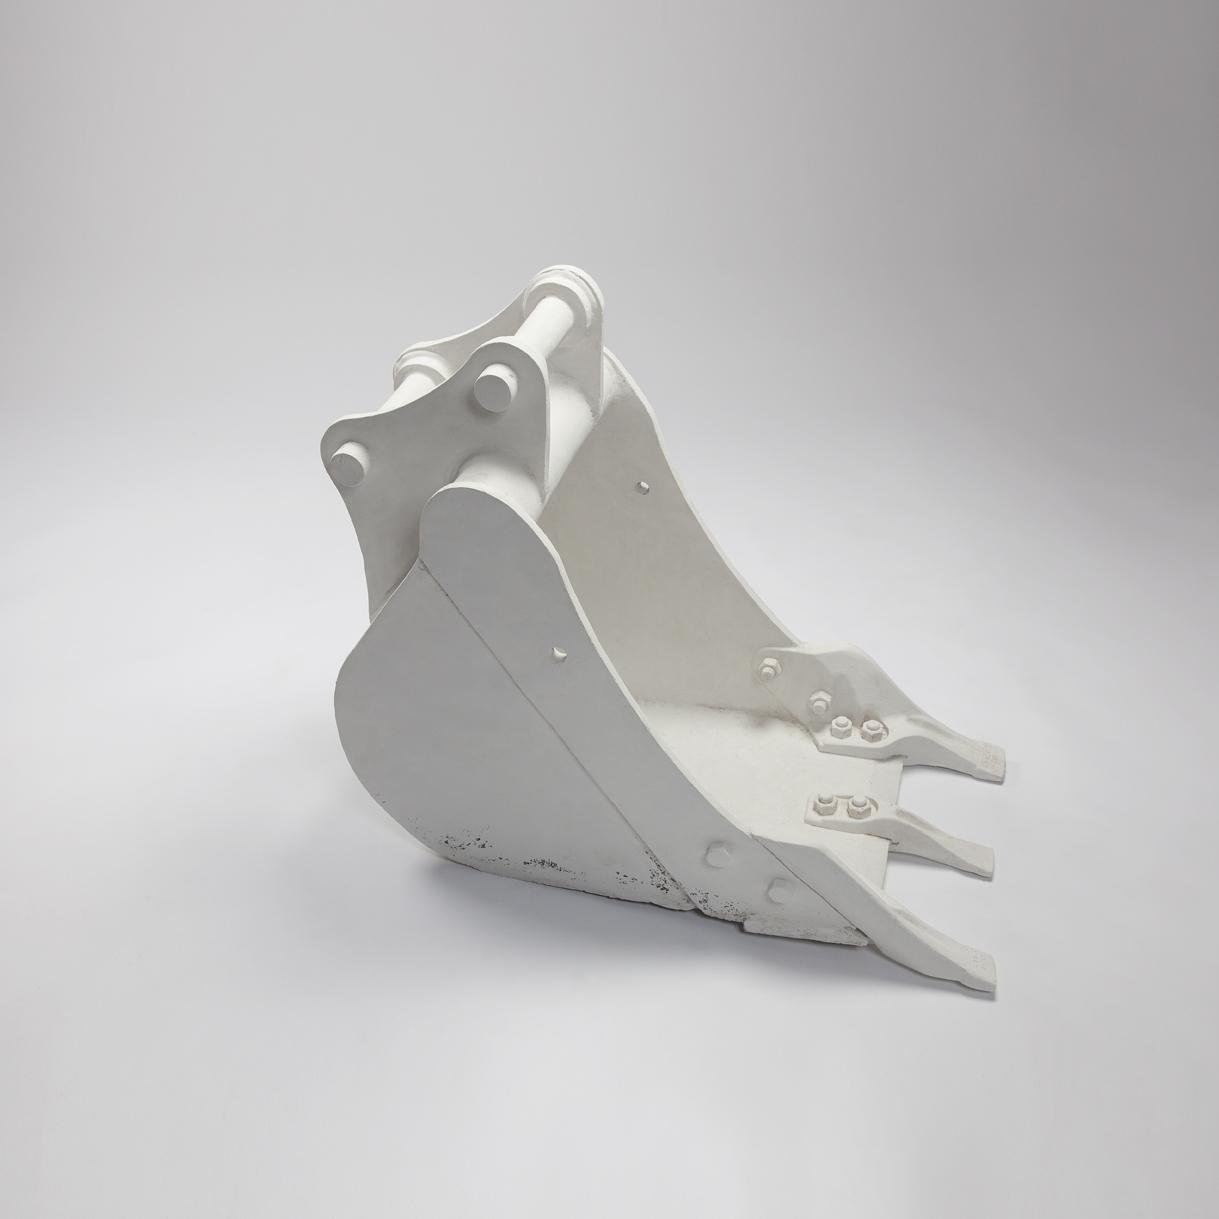 Sculpture by Katja Larsson Cat©Compact(I) 2015